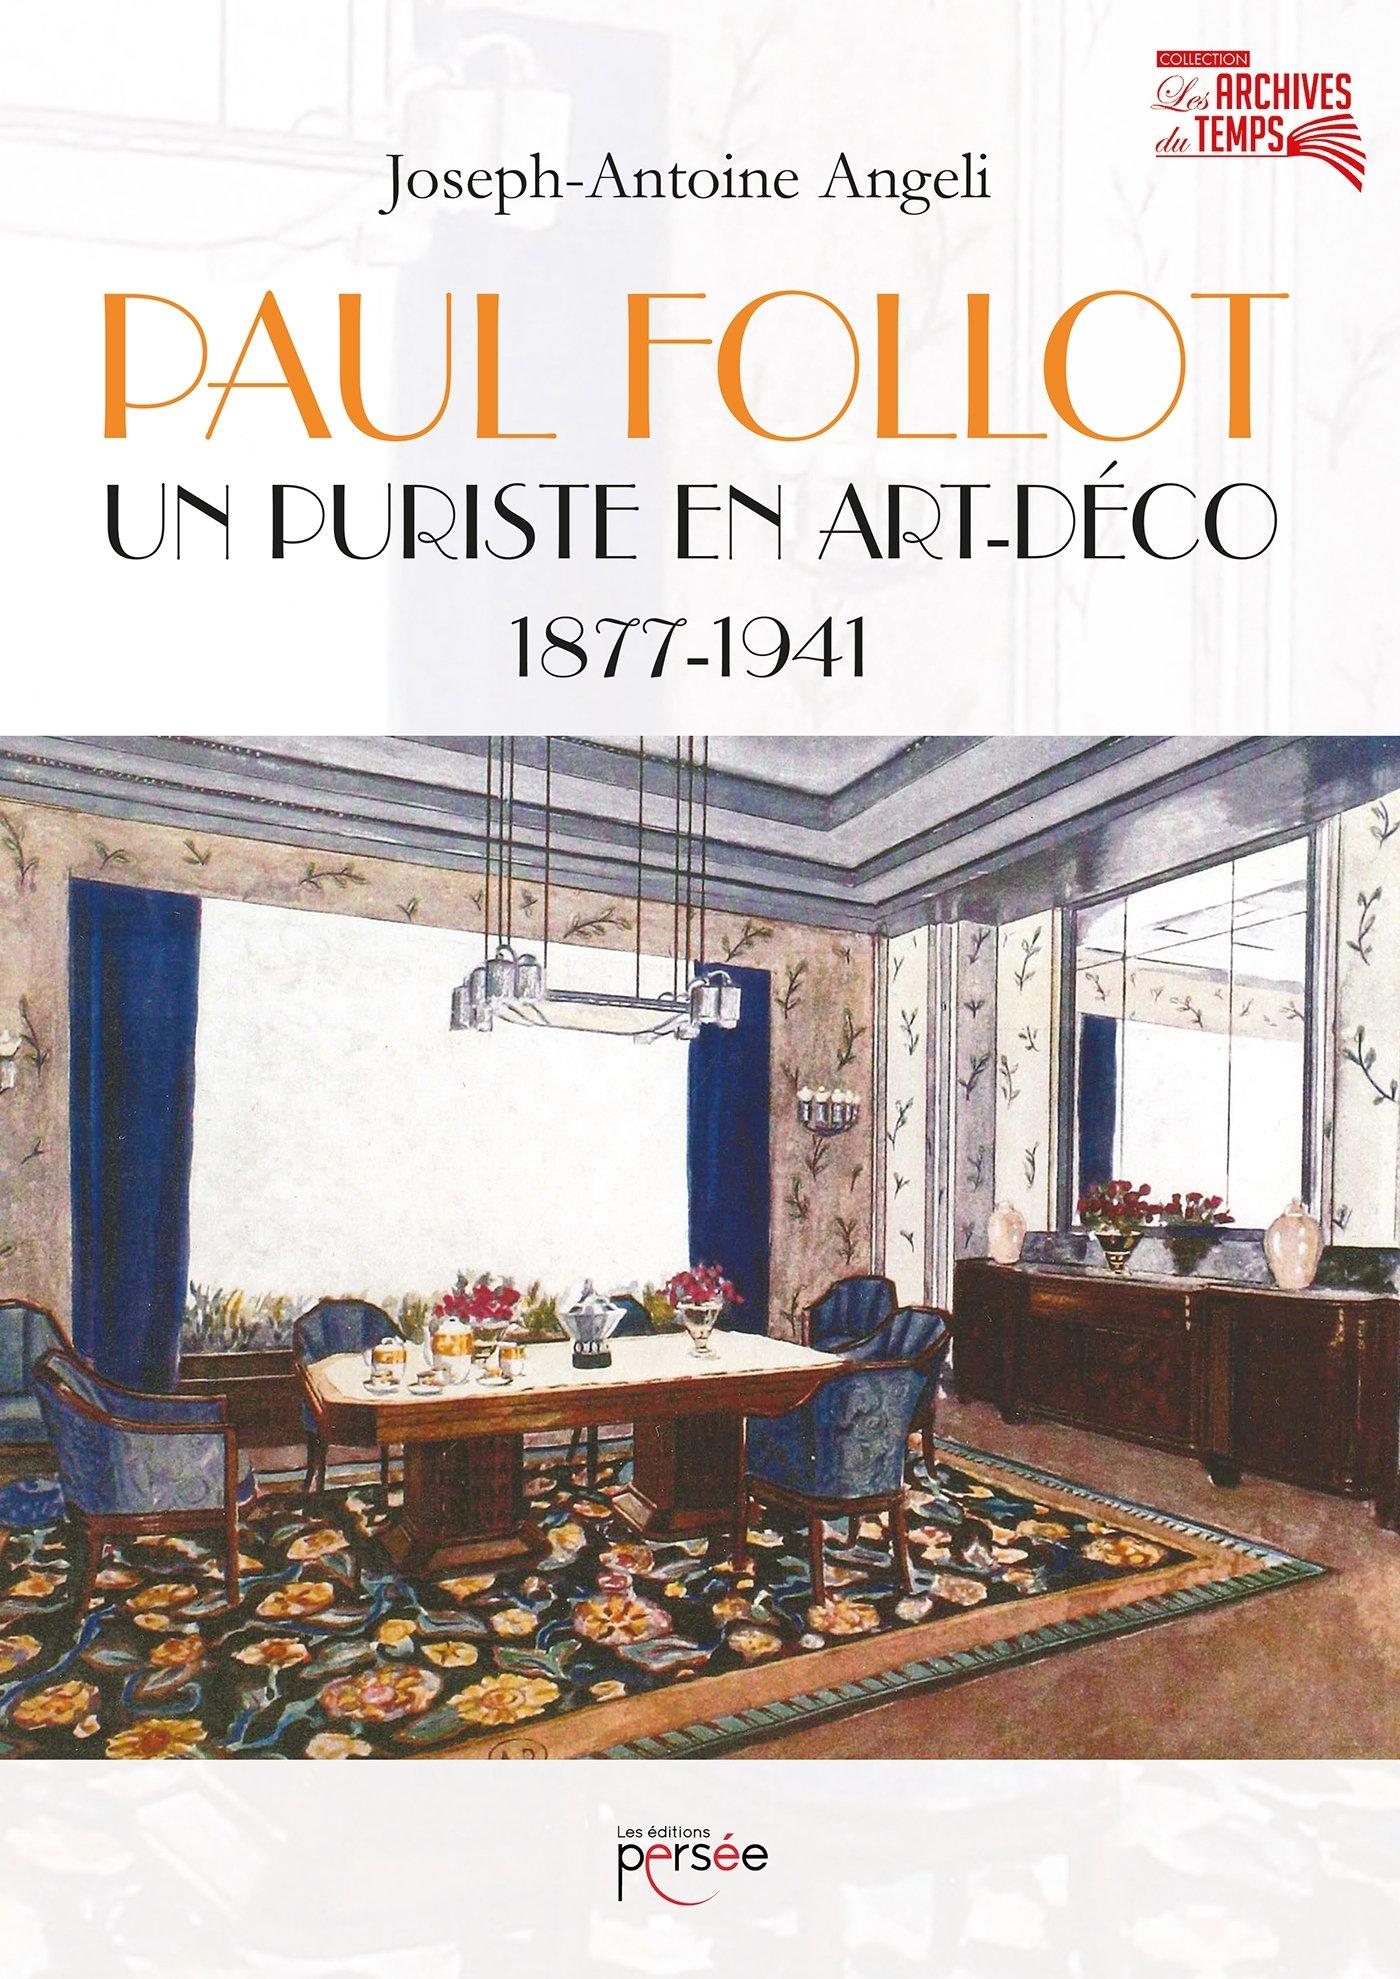 Paul Follot Un puriste en Art-Déco 1877-1941 PDF Text fb2 ebook